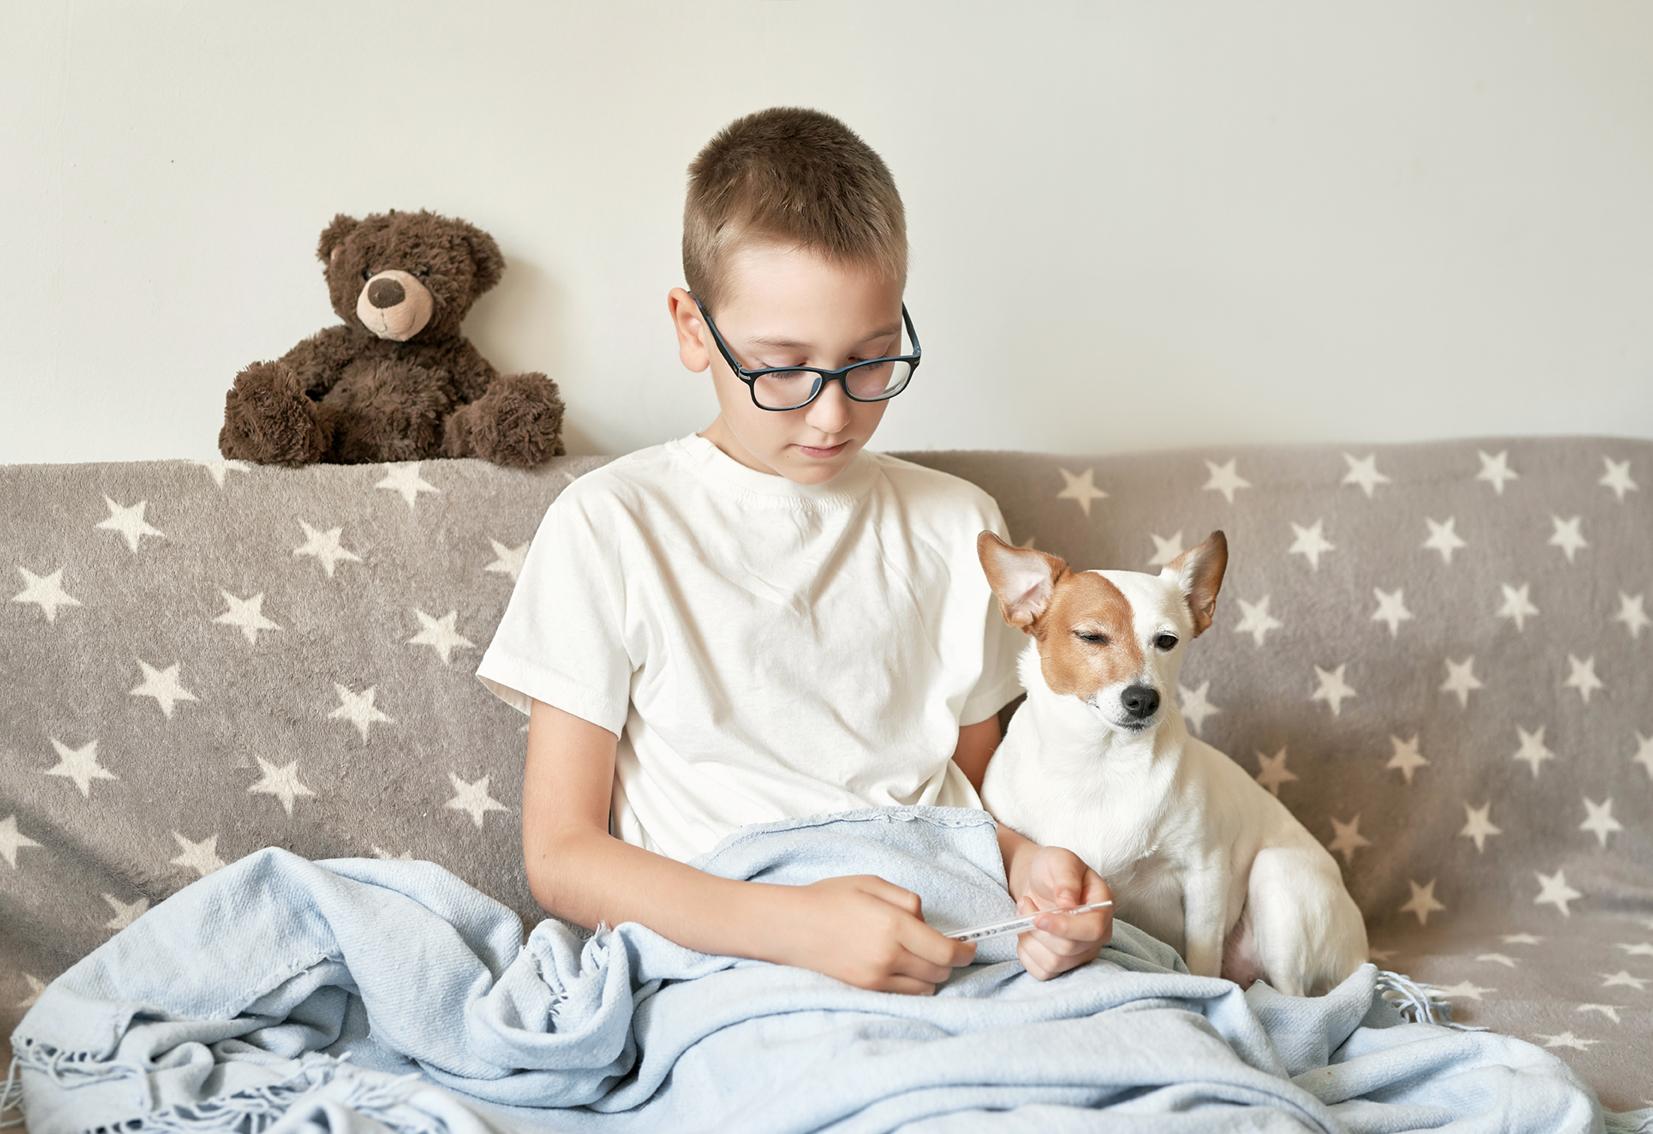 pets-nurse-us-through-illness-01